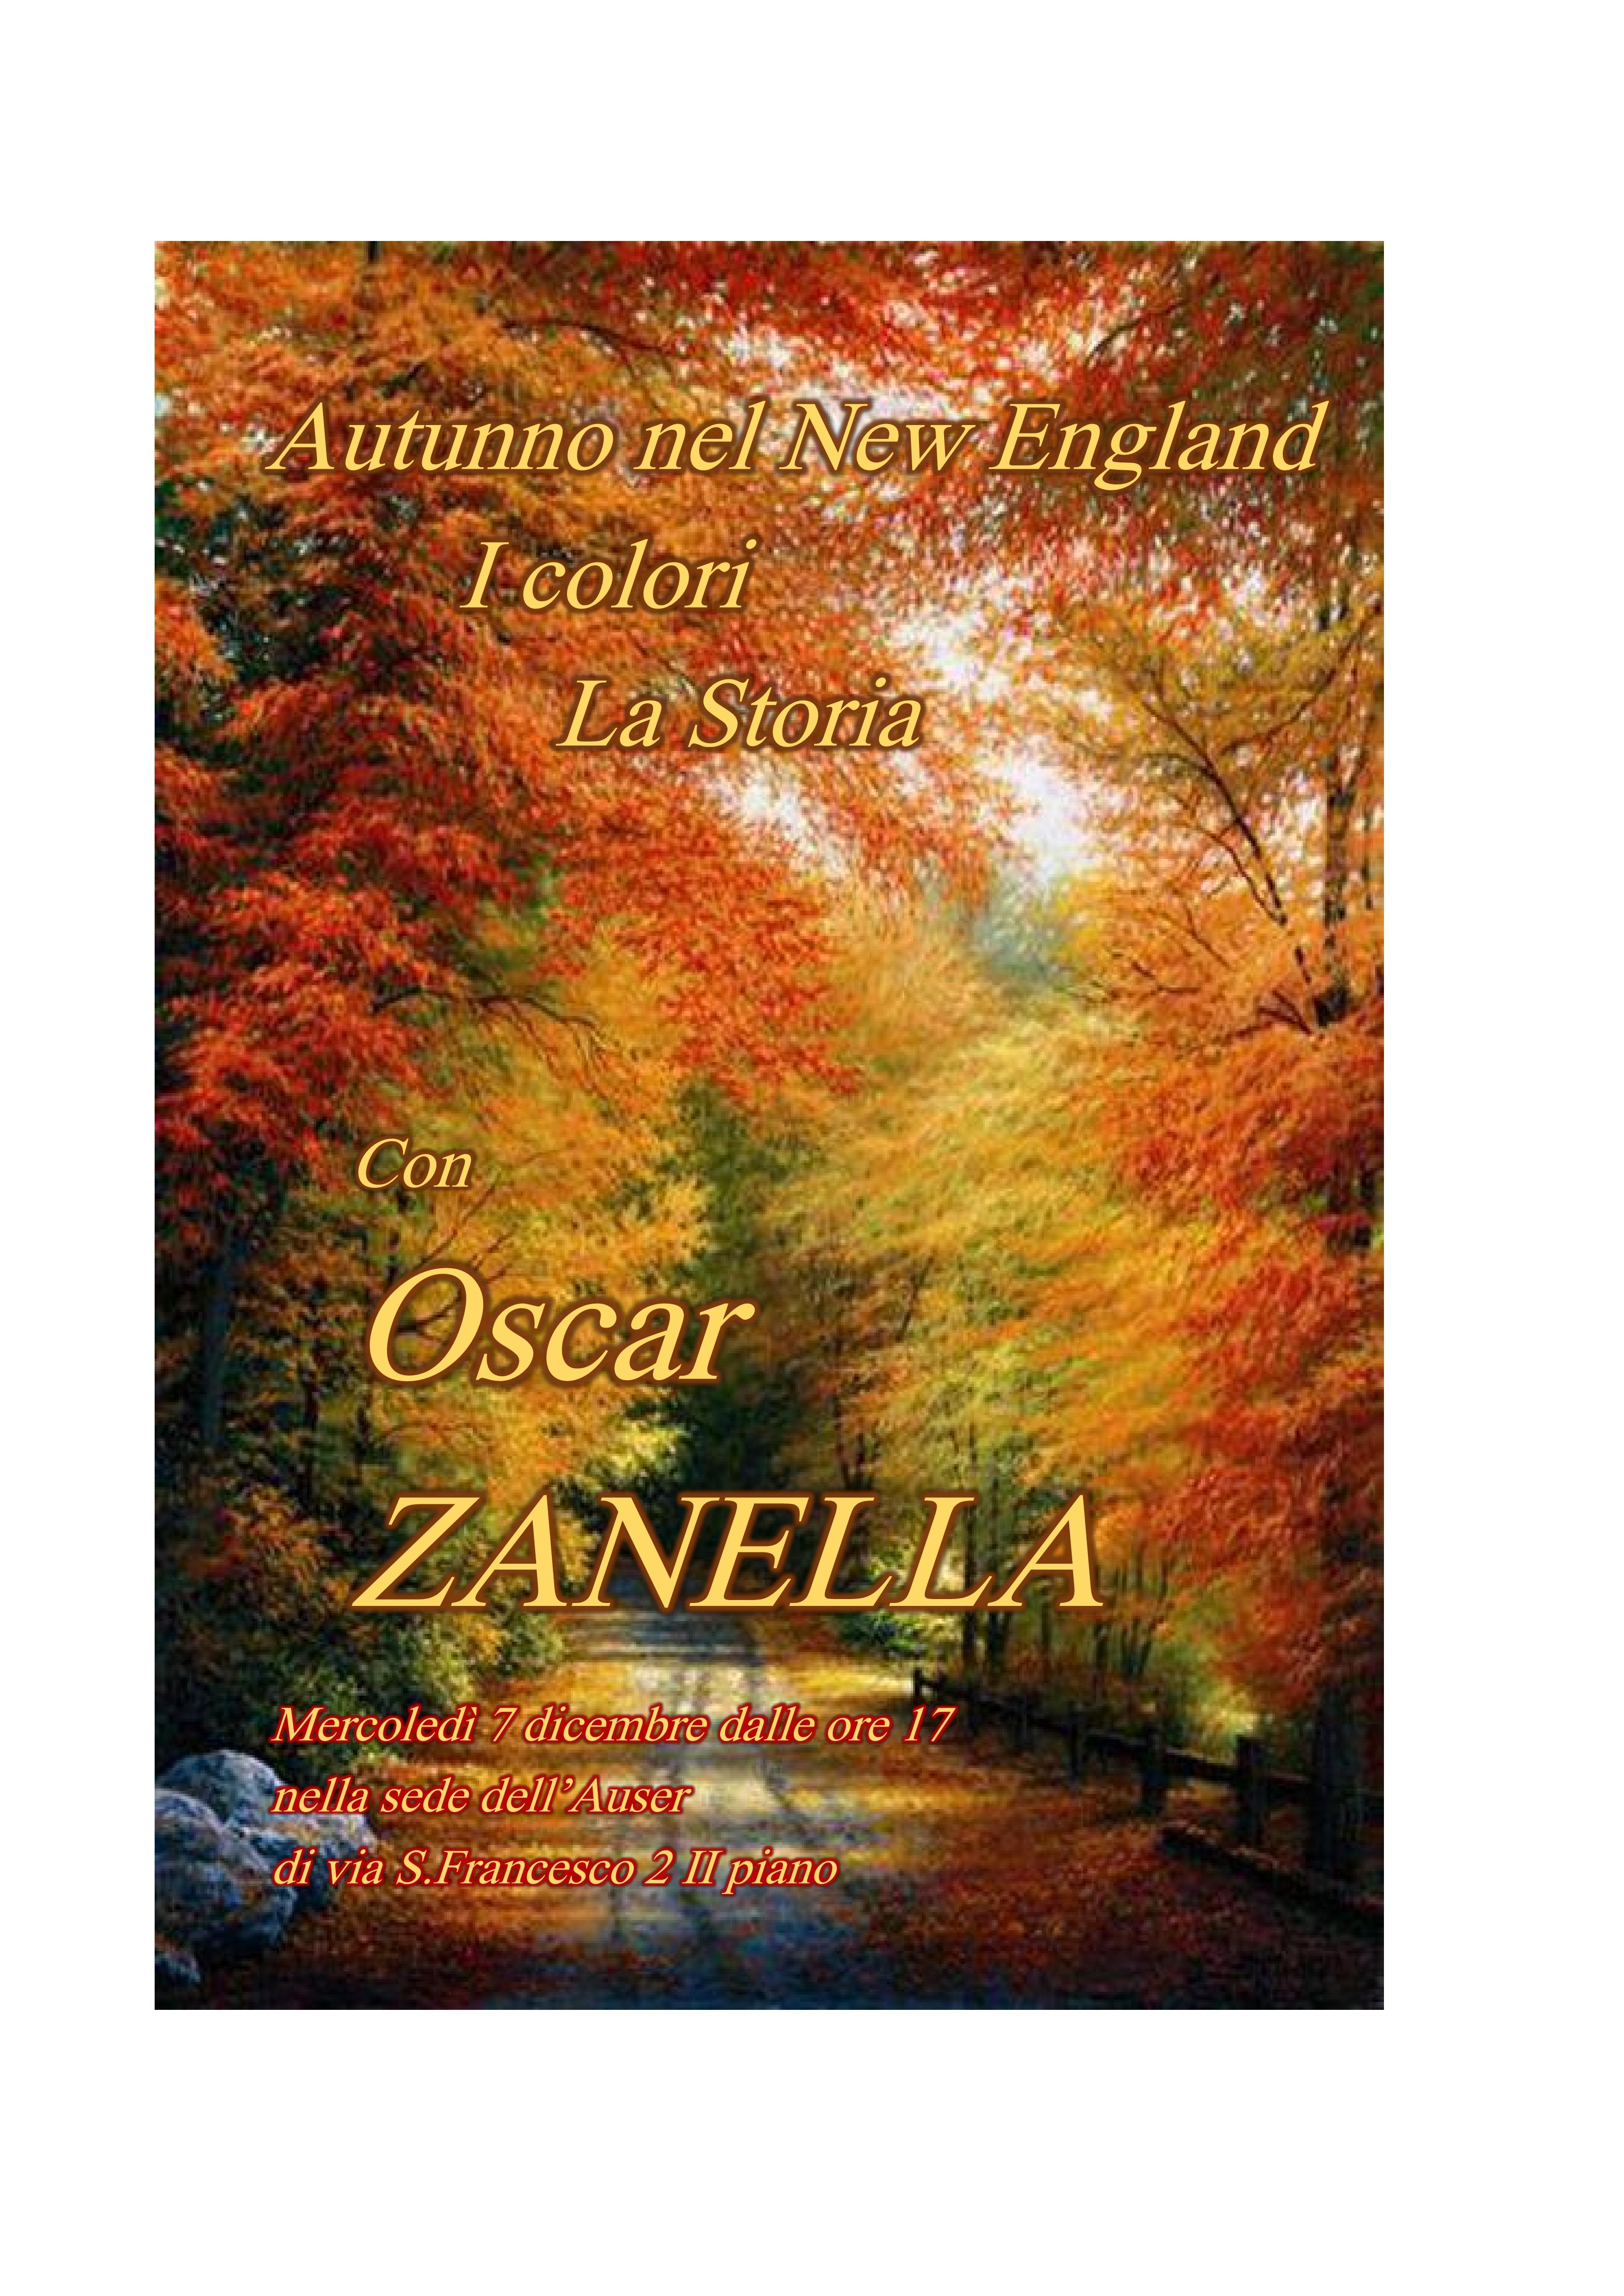 locandina-autunno-in-new-england